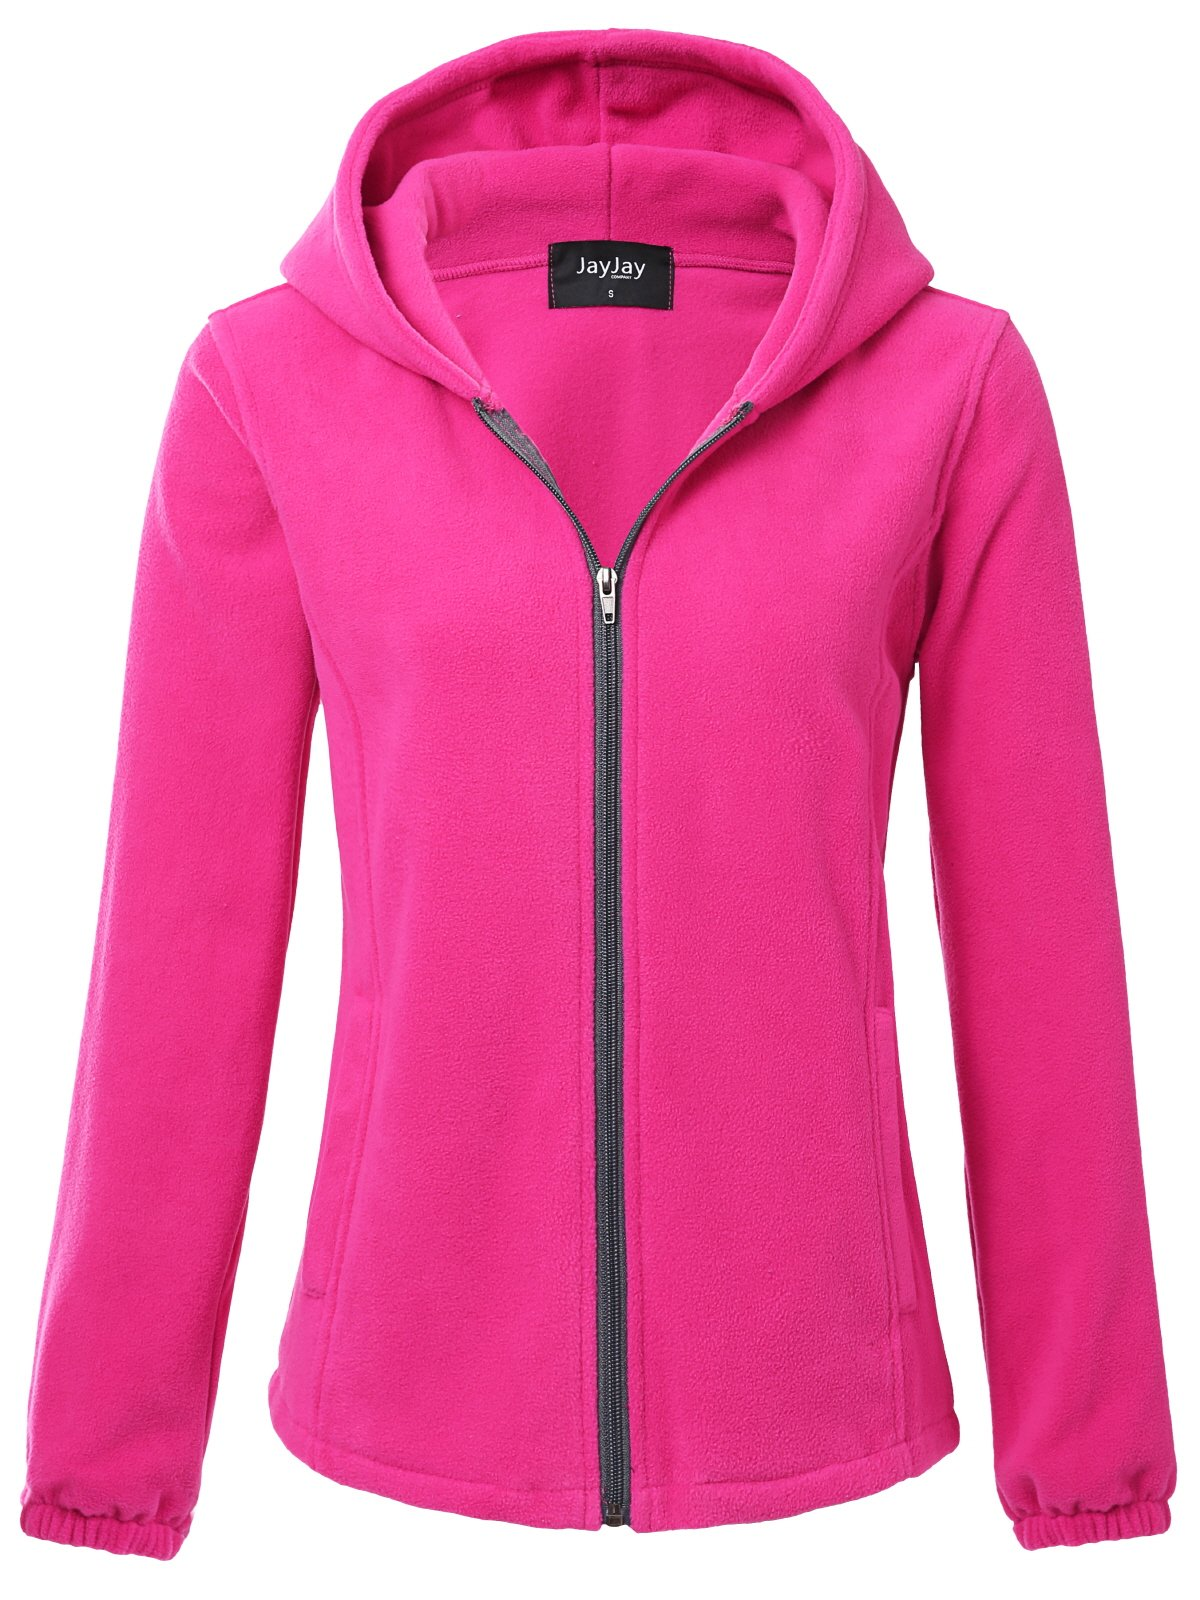 JayJay Women Ultra Soft Fleece Long Sleeve Hoodie Jacket,Fuchsia,2XL